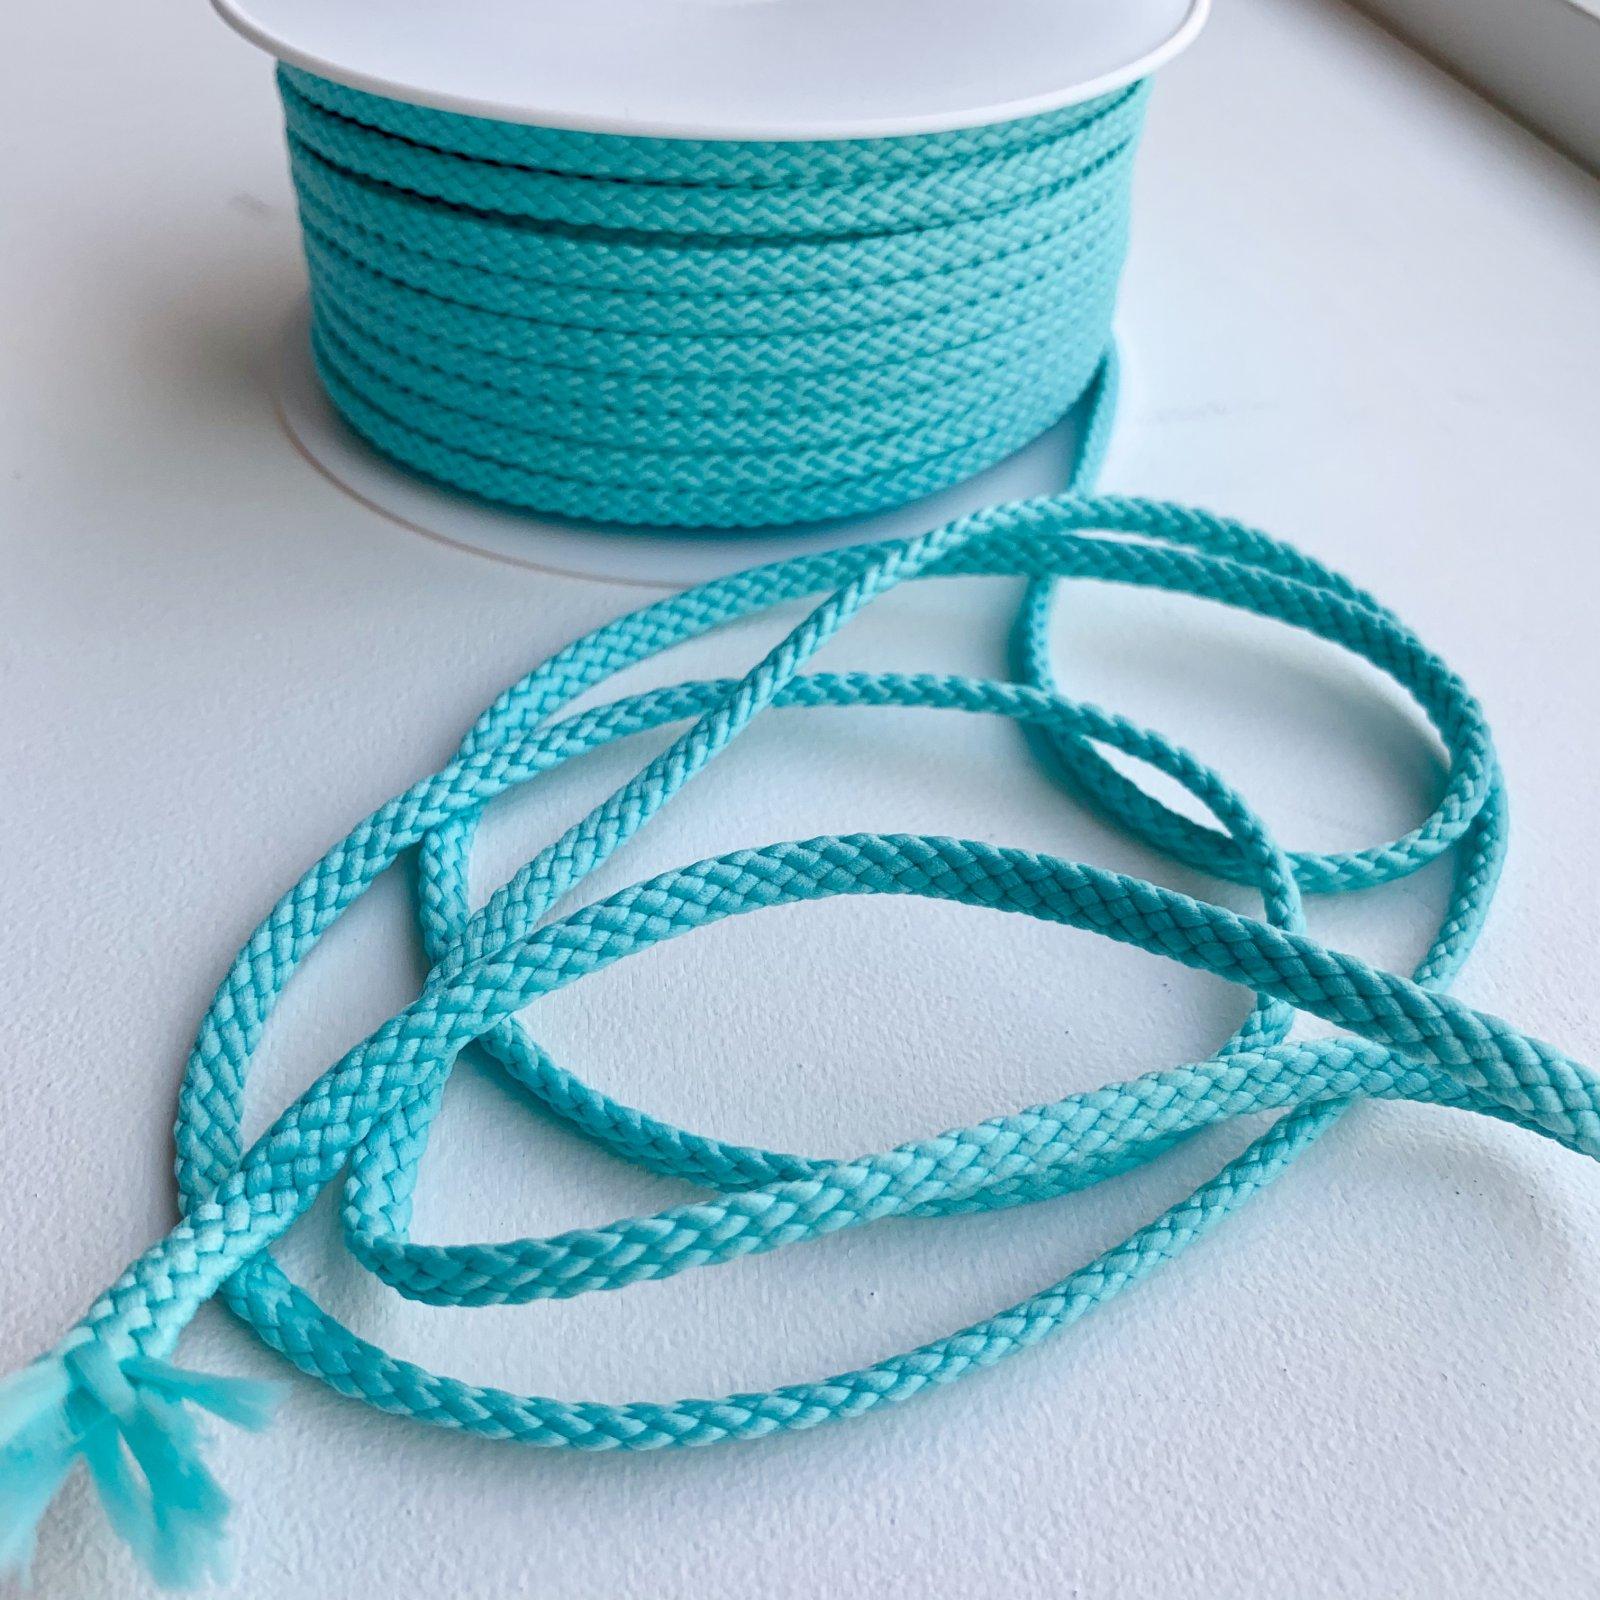 Drawstring Cord - Aqua